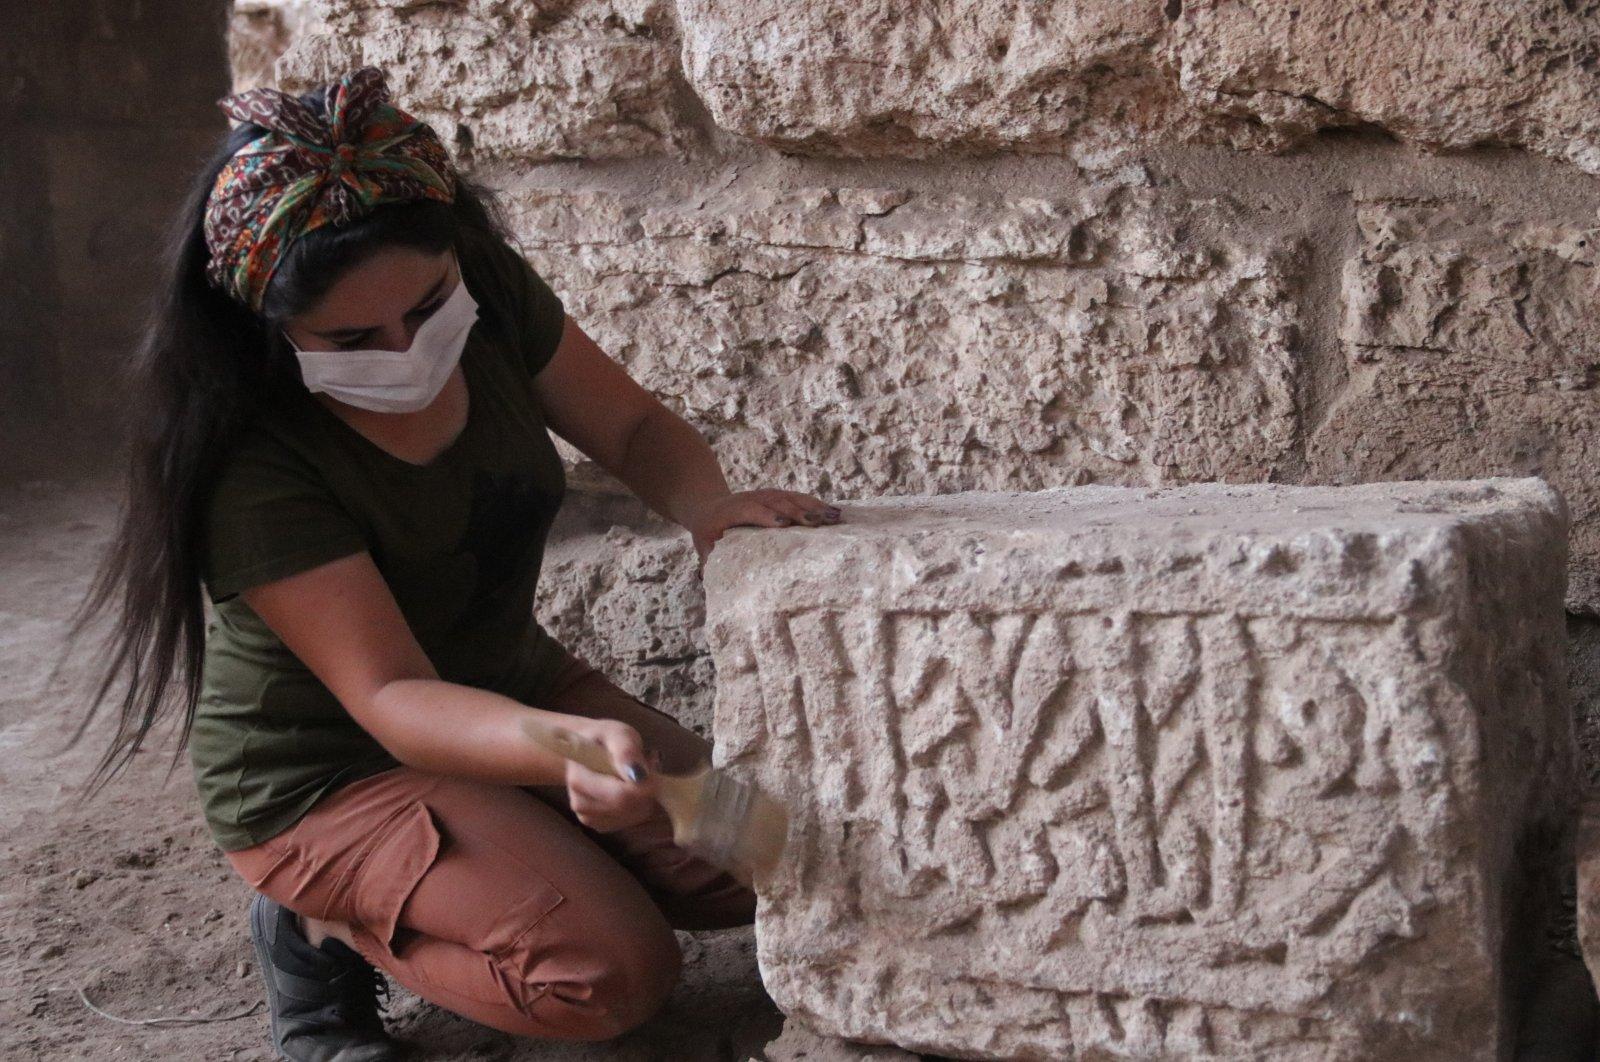 An archaeologist cleans an artifact found in the Harran archaeological site in Şanlıurfa, southeastern Turkey, Dec. 12, 2020. (AA PHOTO)